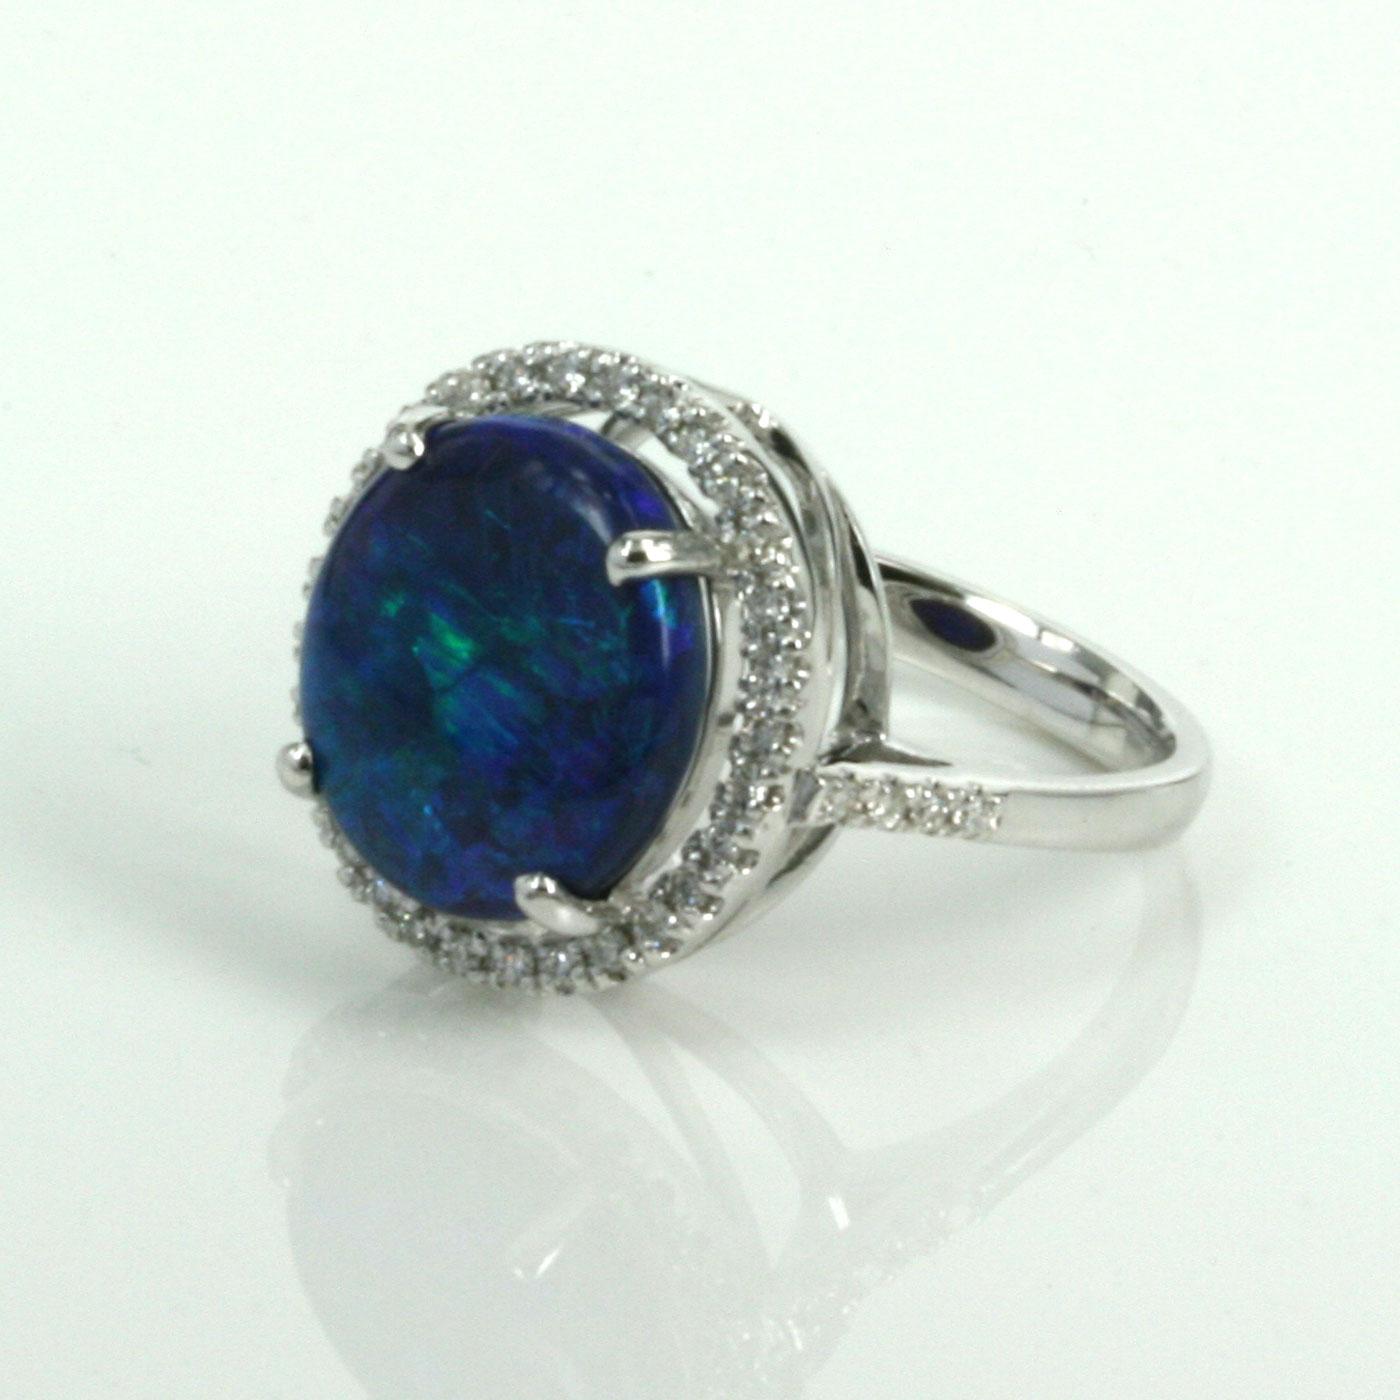 Buy 5 Carat Lightning Ridge Black Opal And Diamond Ring